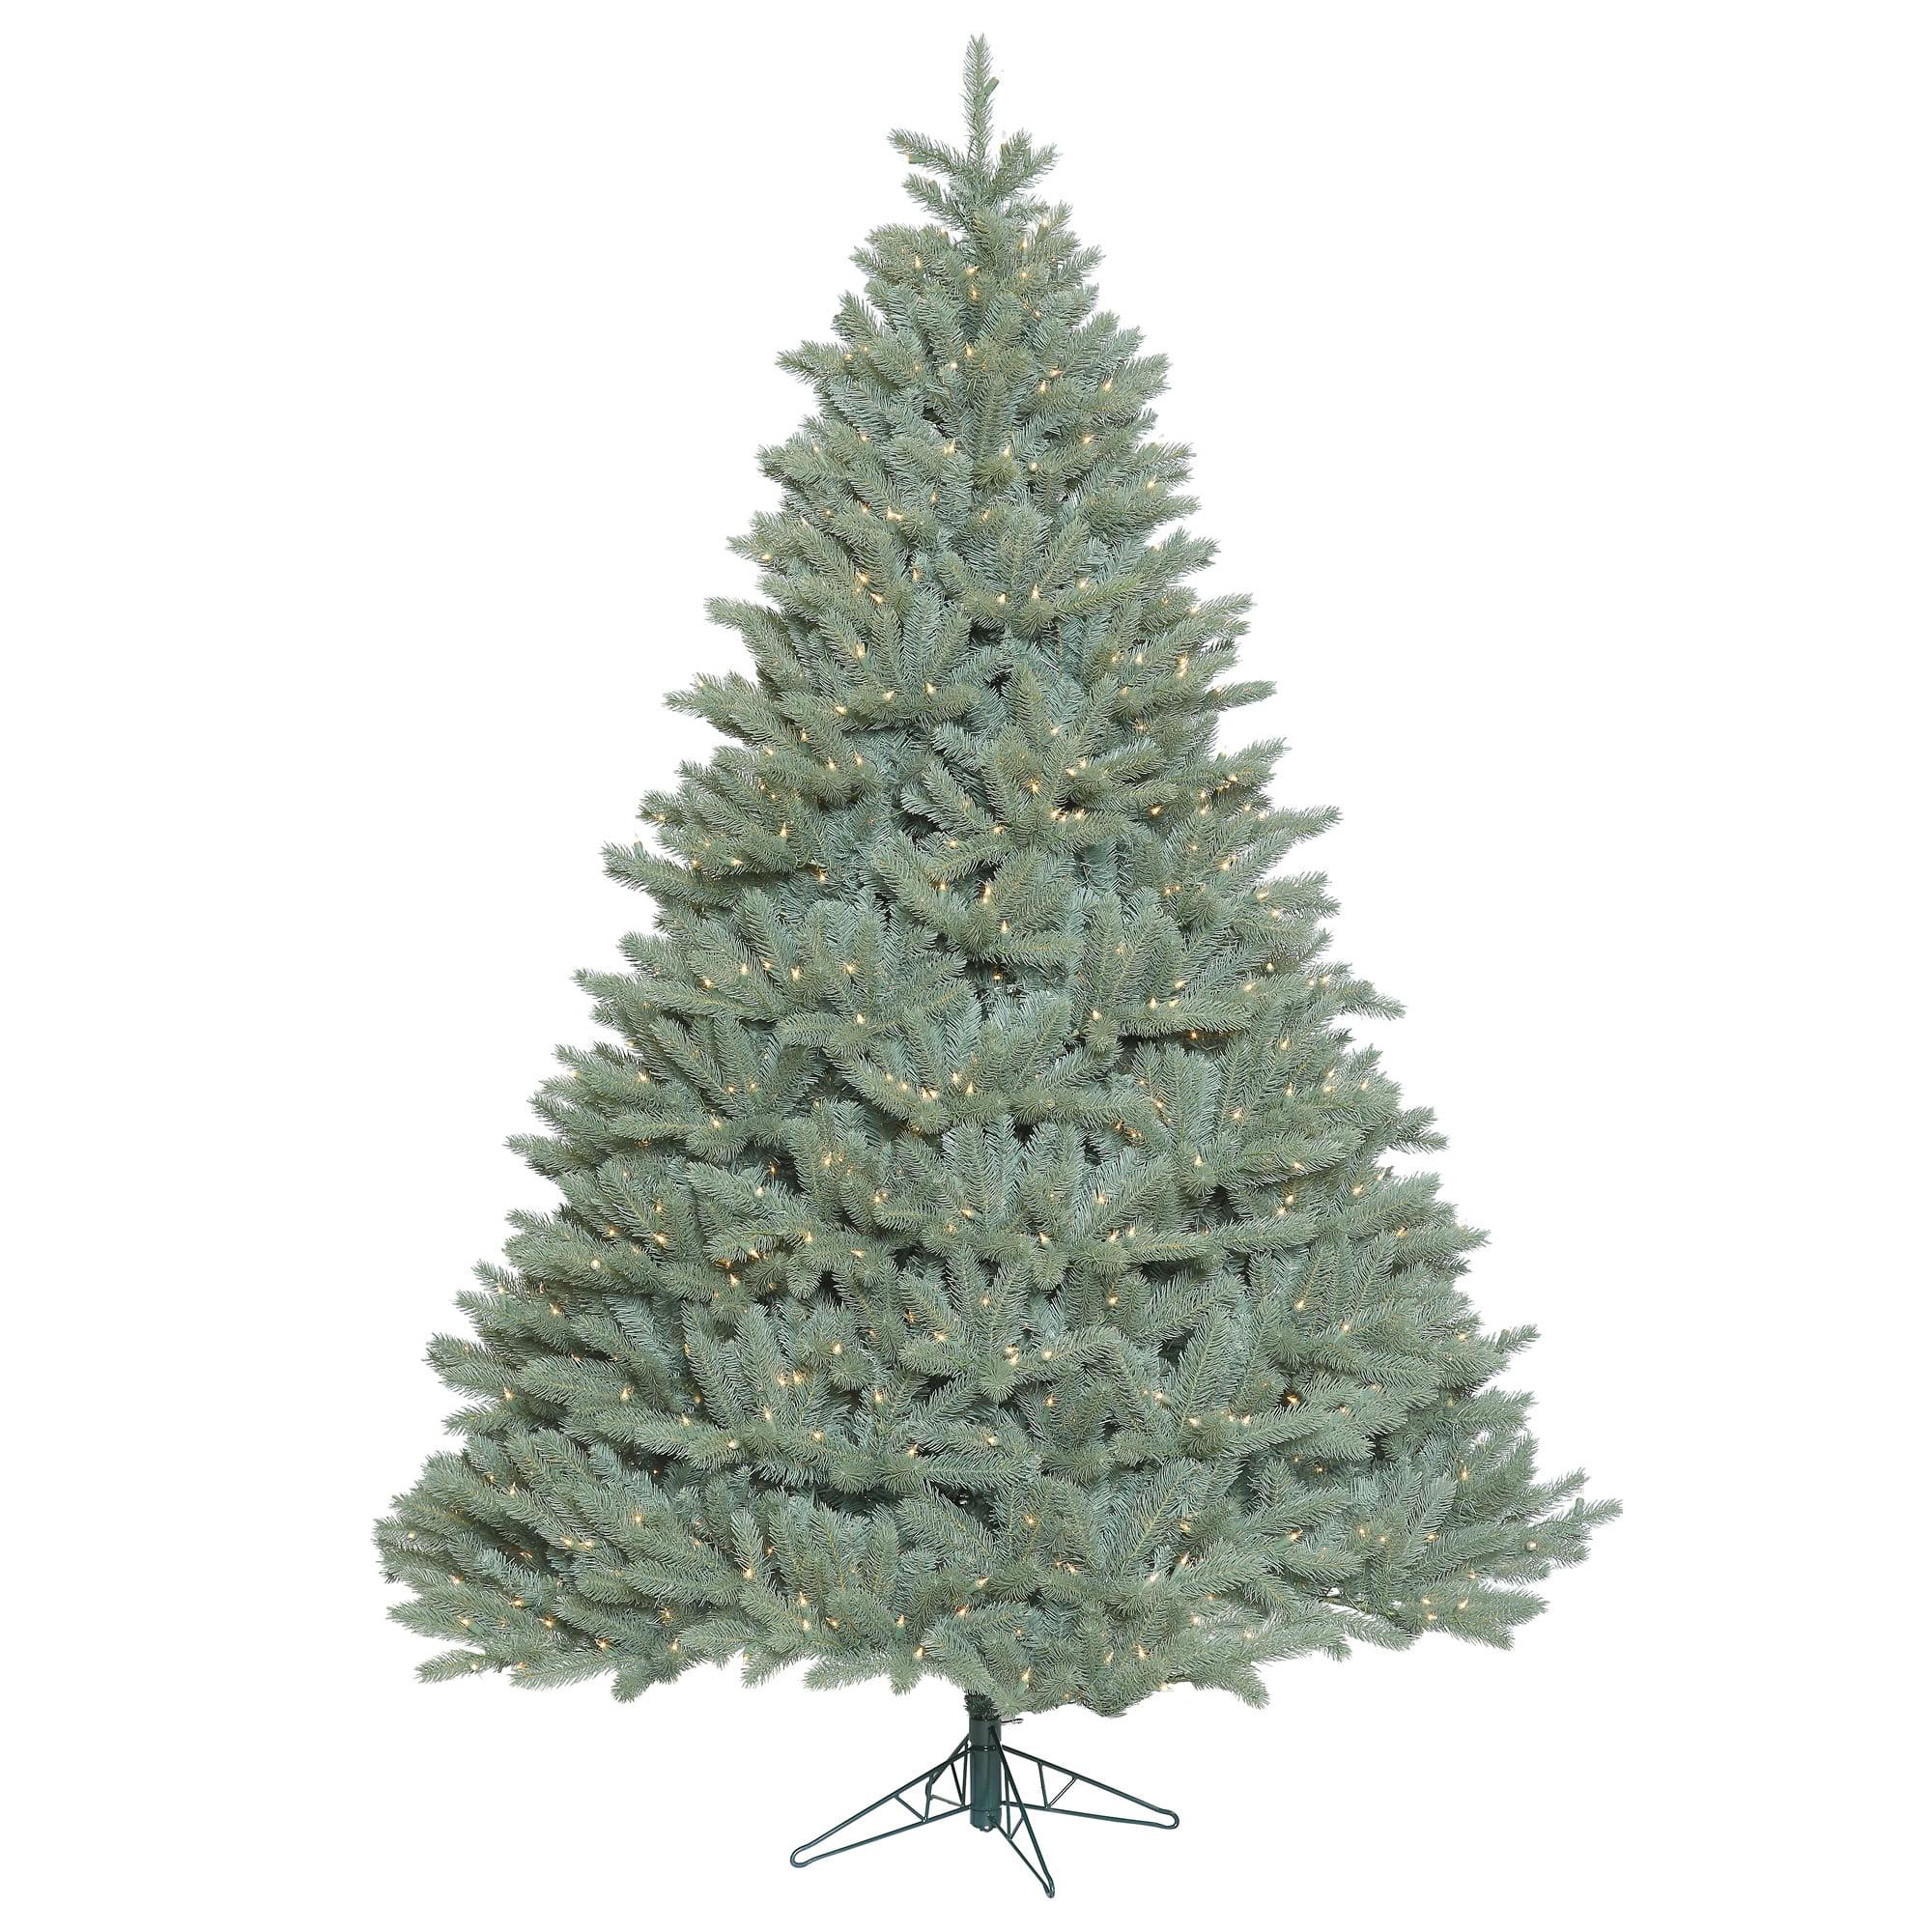 Vickerman Artificial Christmas Tree 6.5' x 58'' Colorado Blue Spruce Dura-Lit 850 Clear Lights